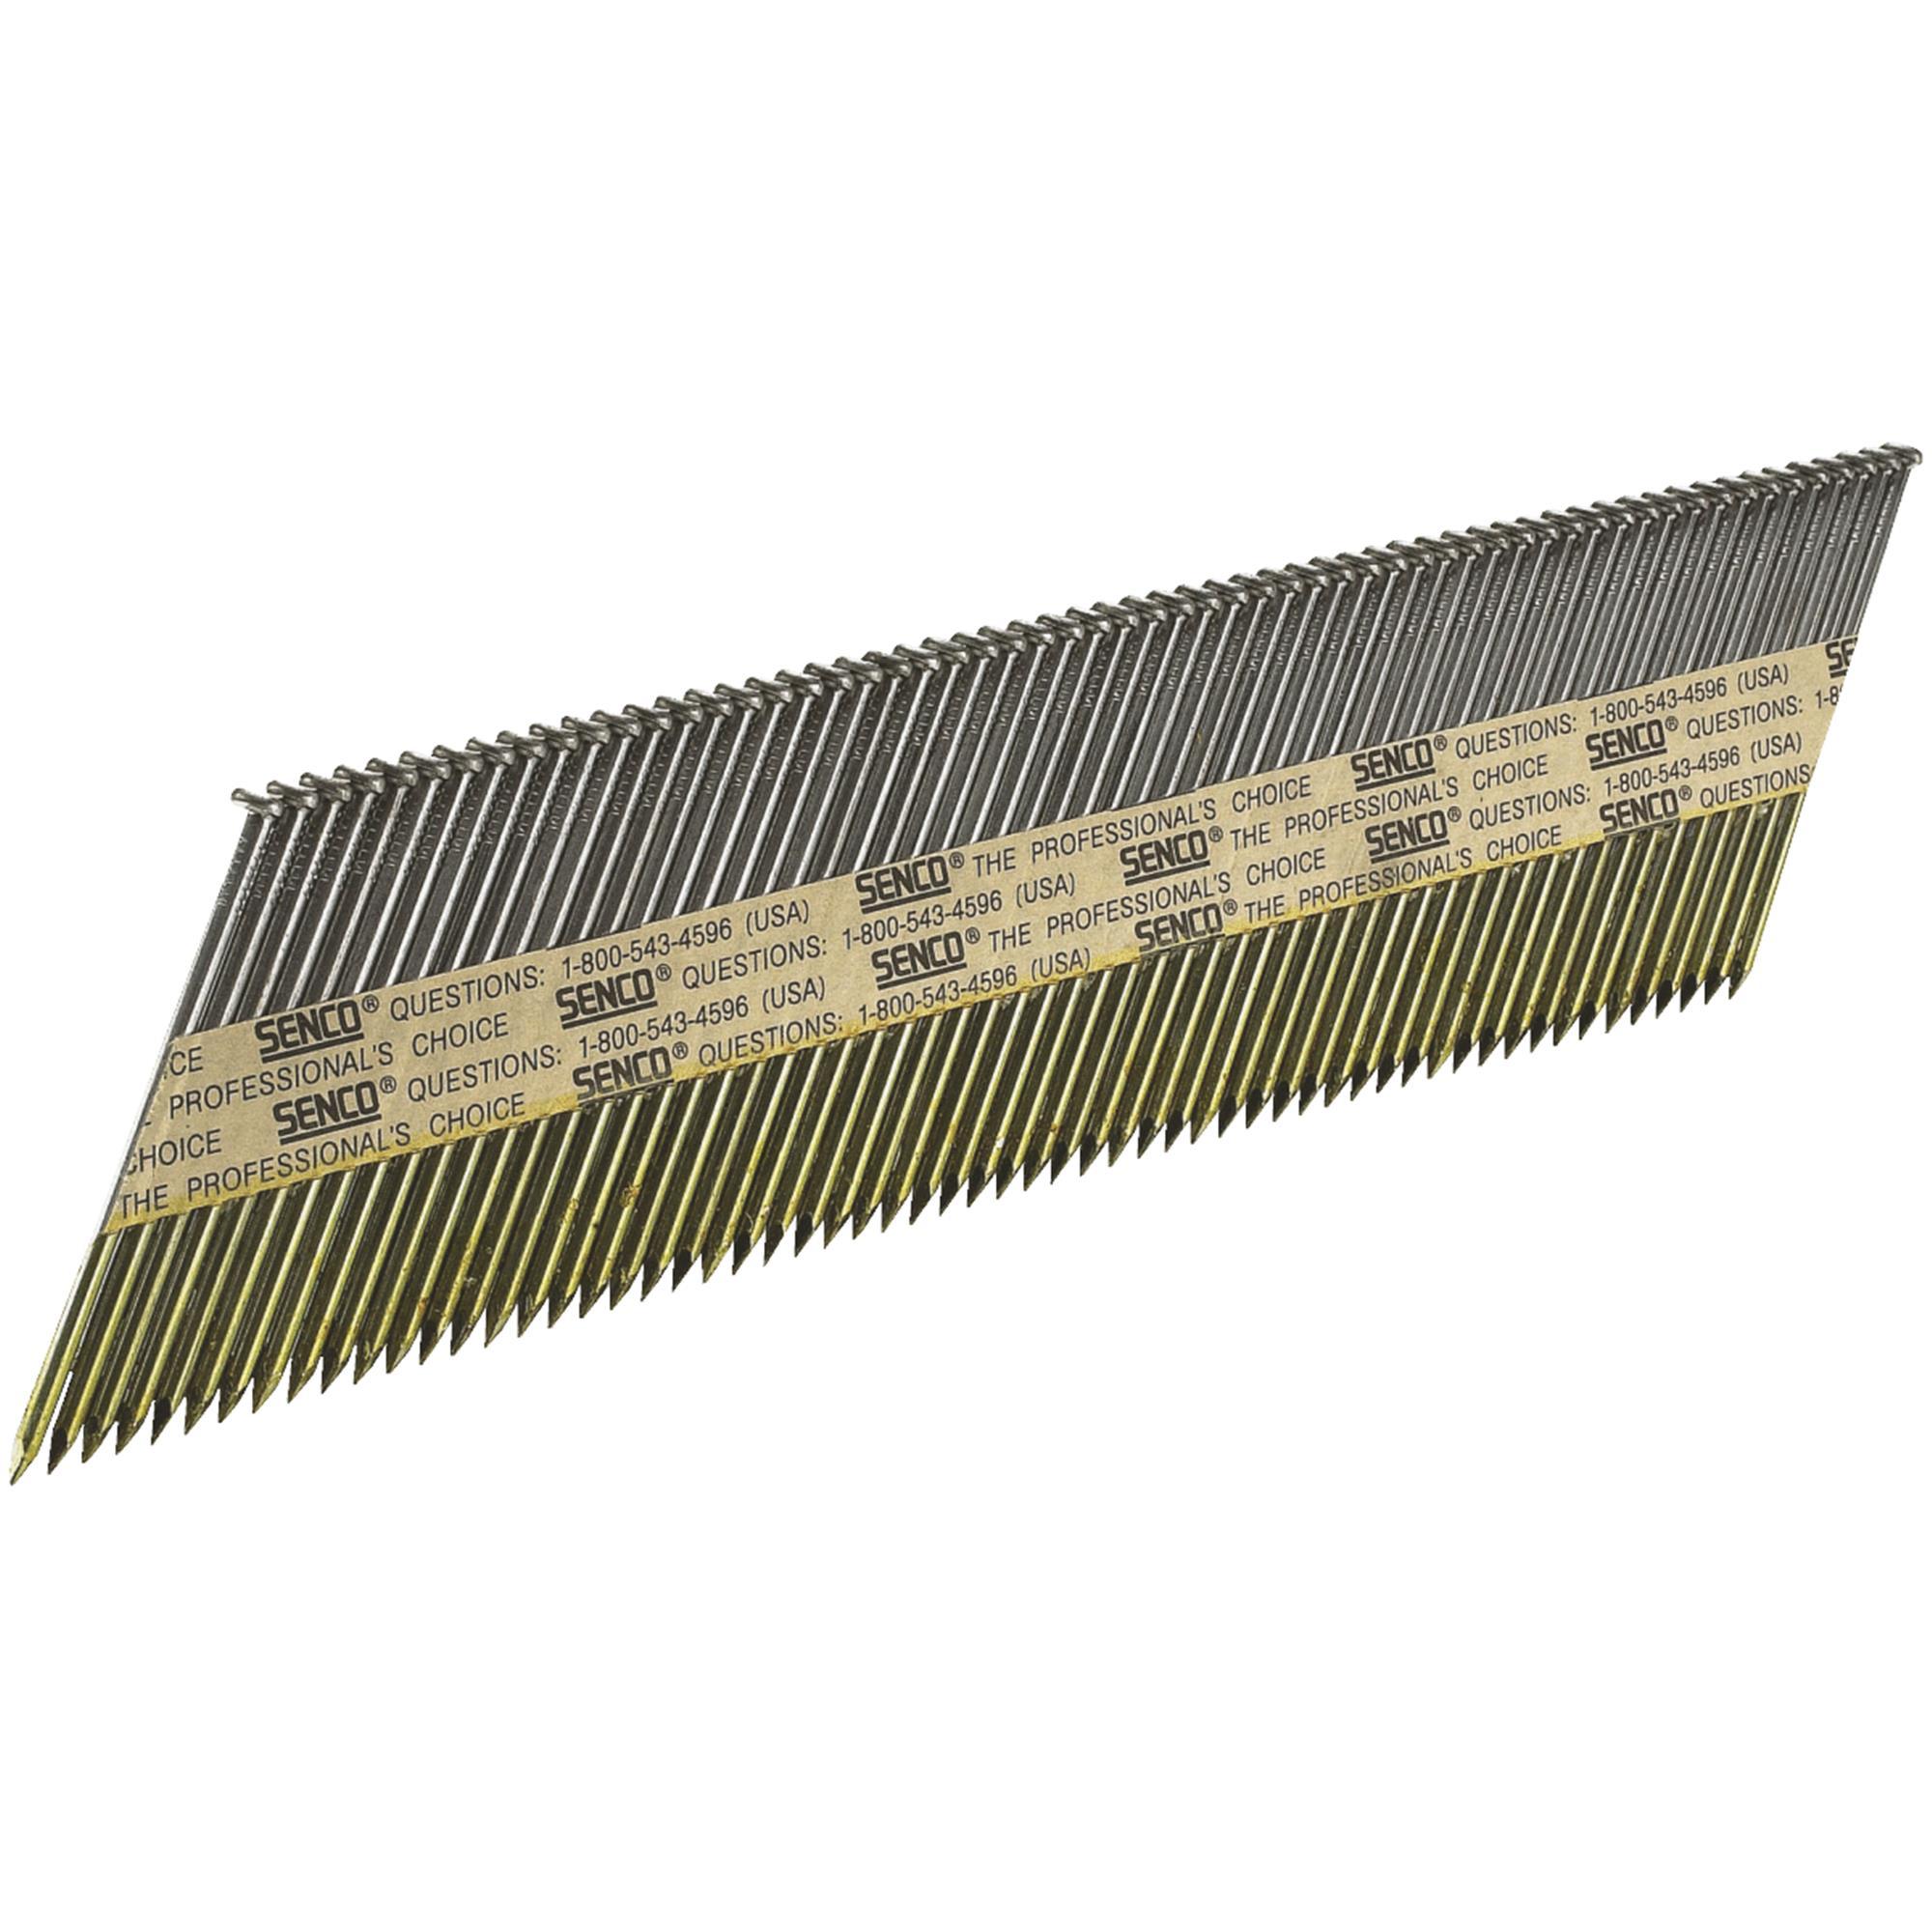 Senco 34 Degree Paper Tape Clipped Head Framing Stick Nail by Senco